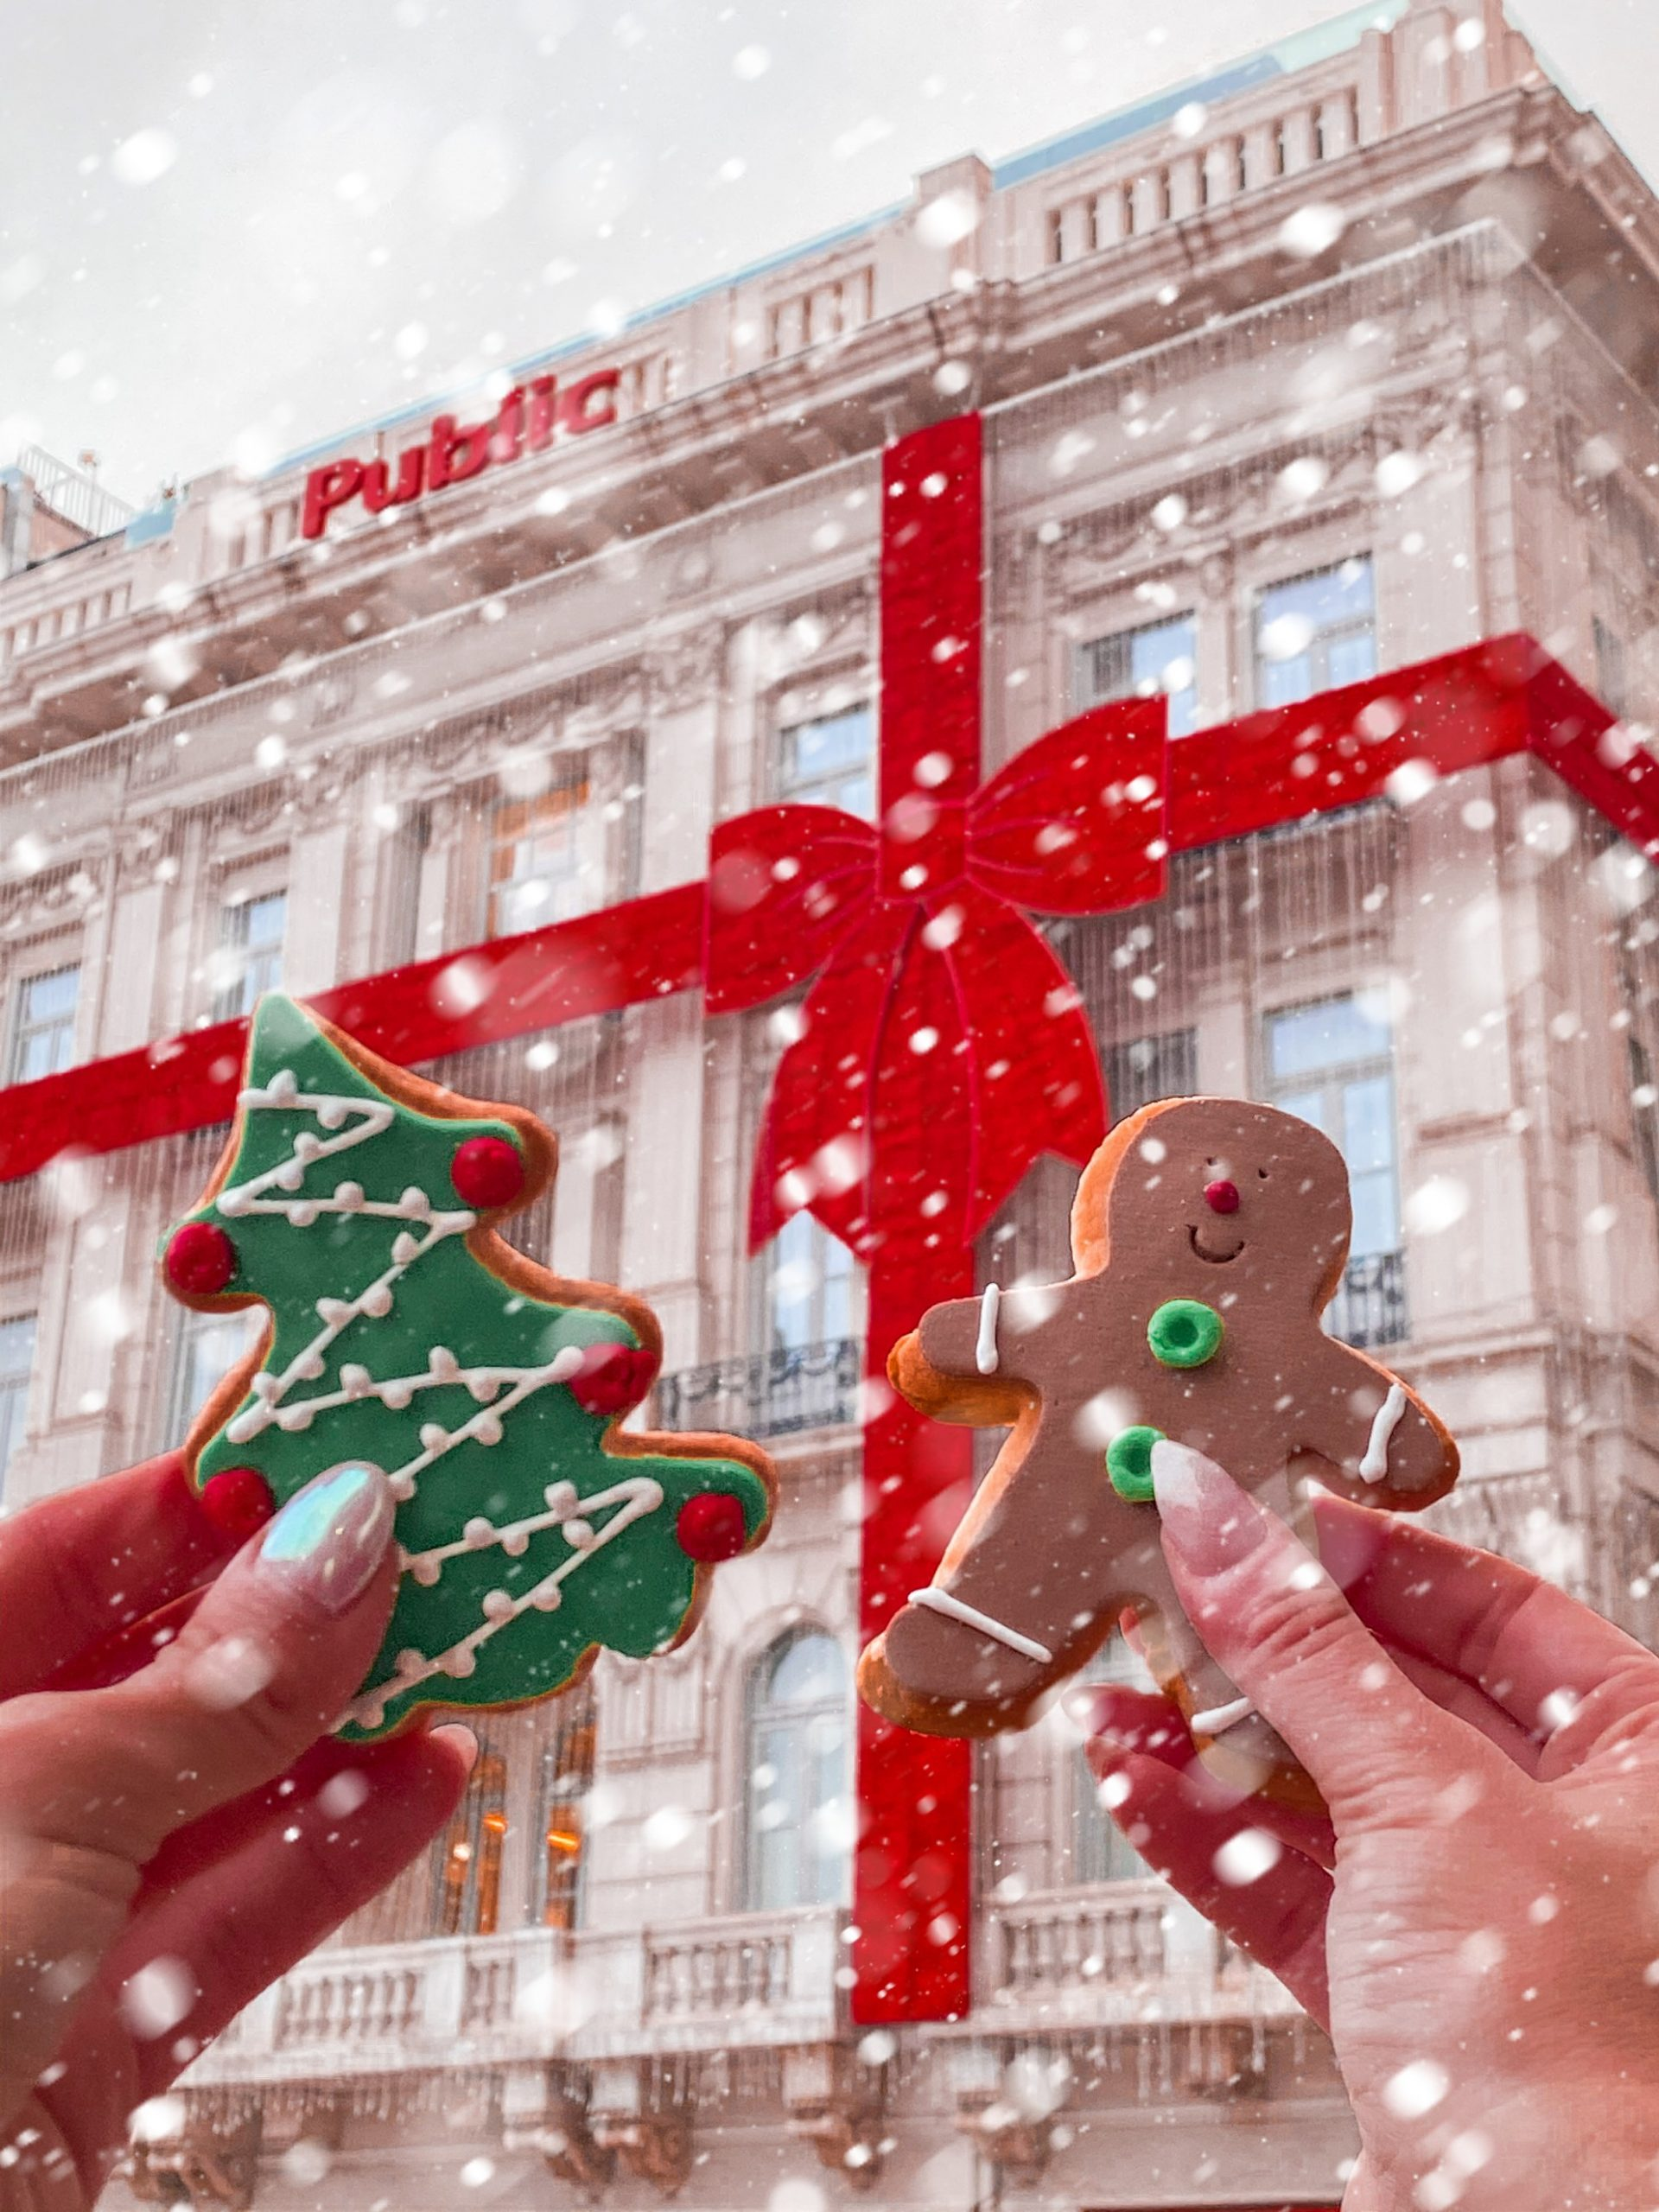 public syntagma square christmas